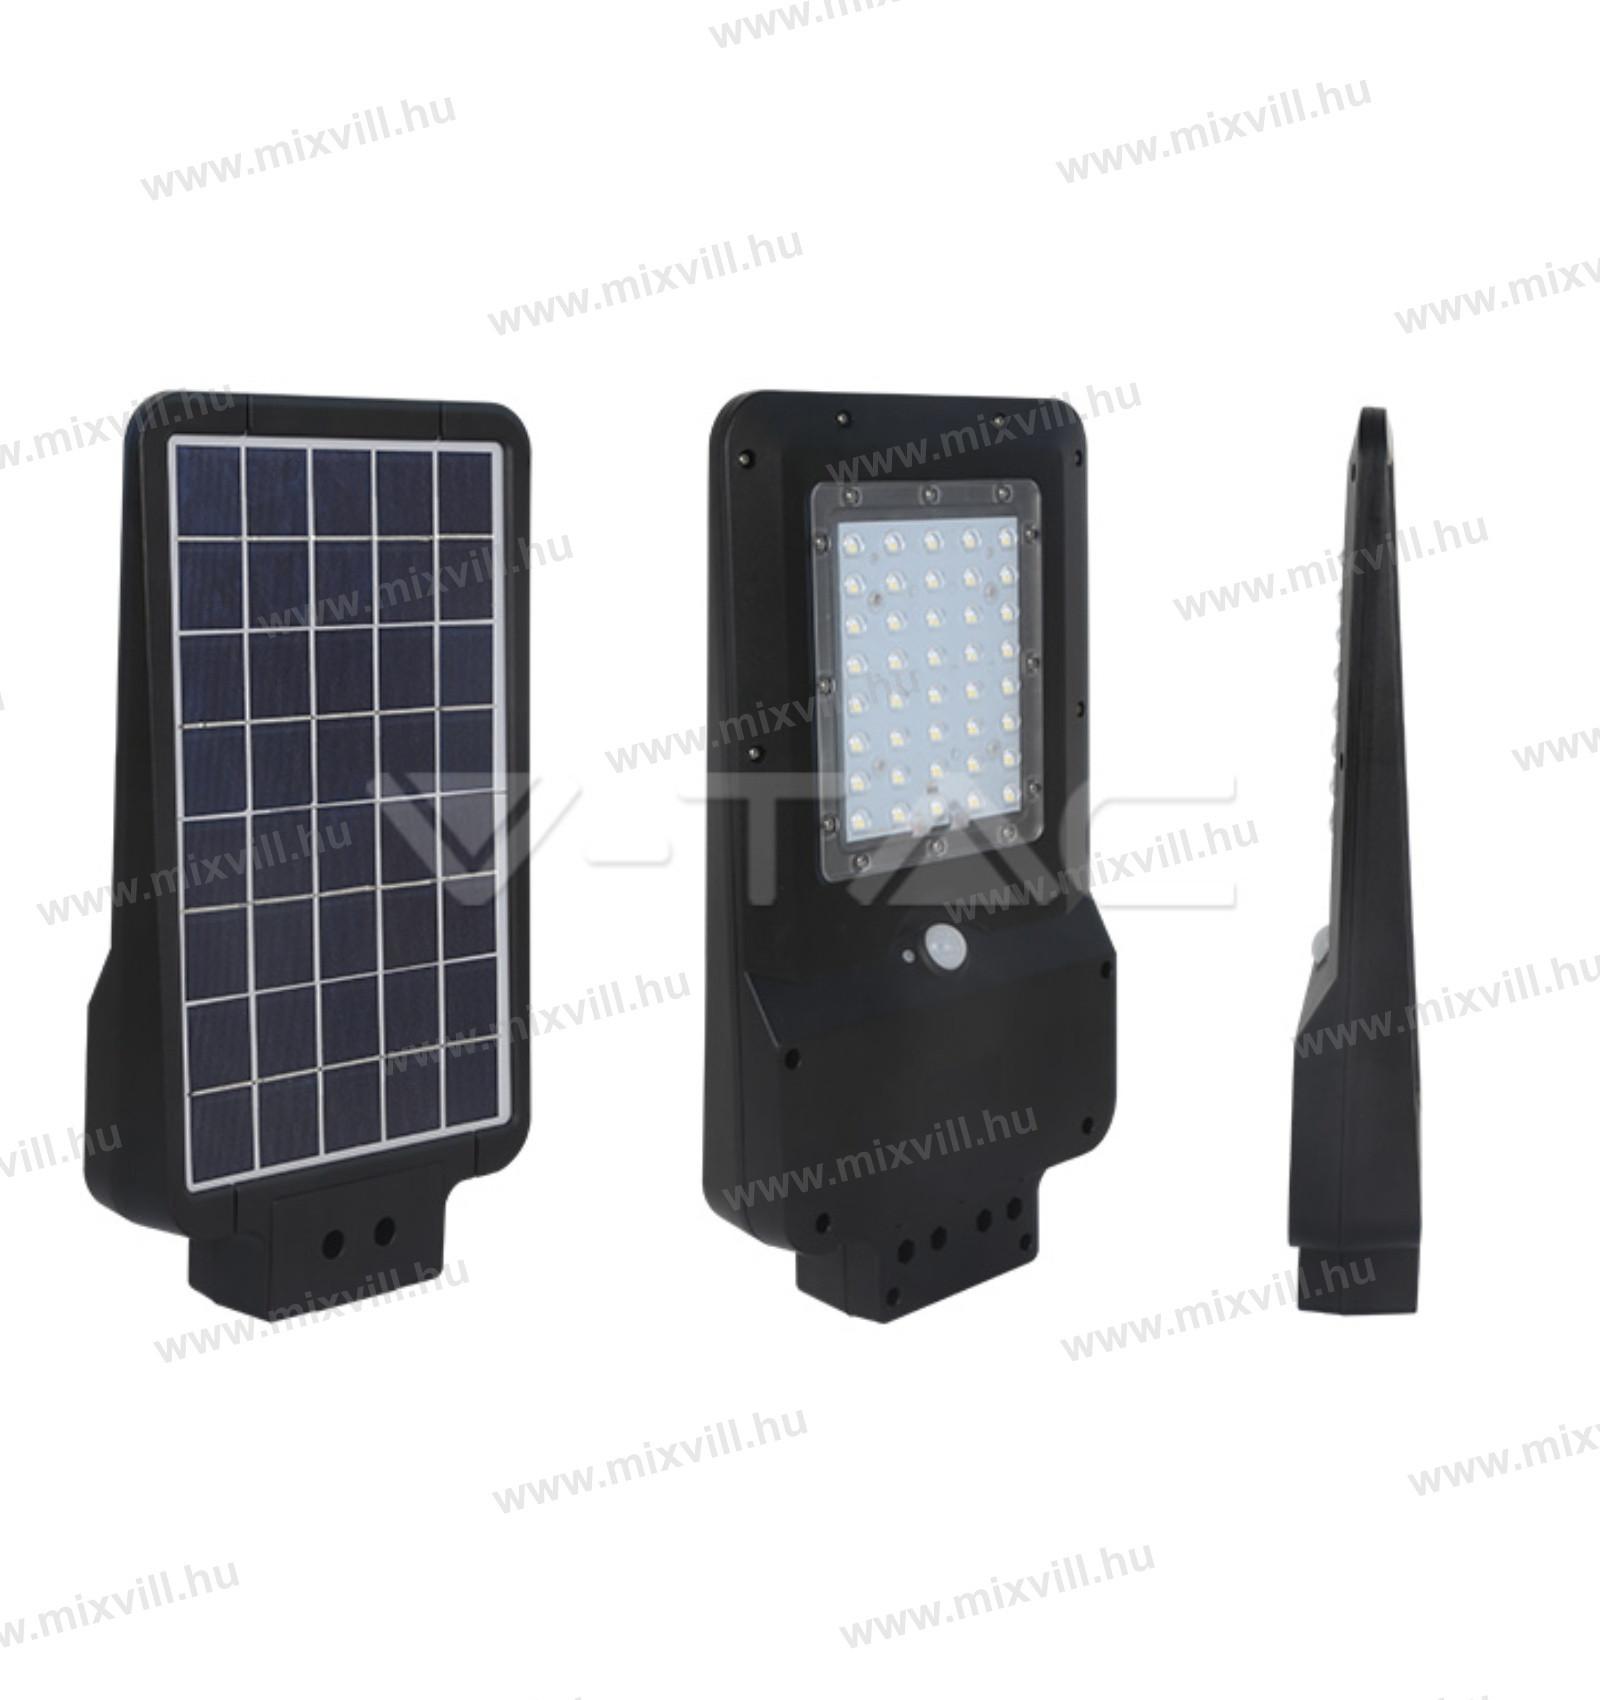 8549-sku-v-tac-solar-szolar-kulteri-led-lampa-utcailampa-kozvilagitasi-led-lampa-napelemes-15w